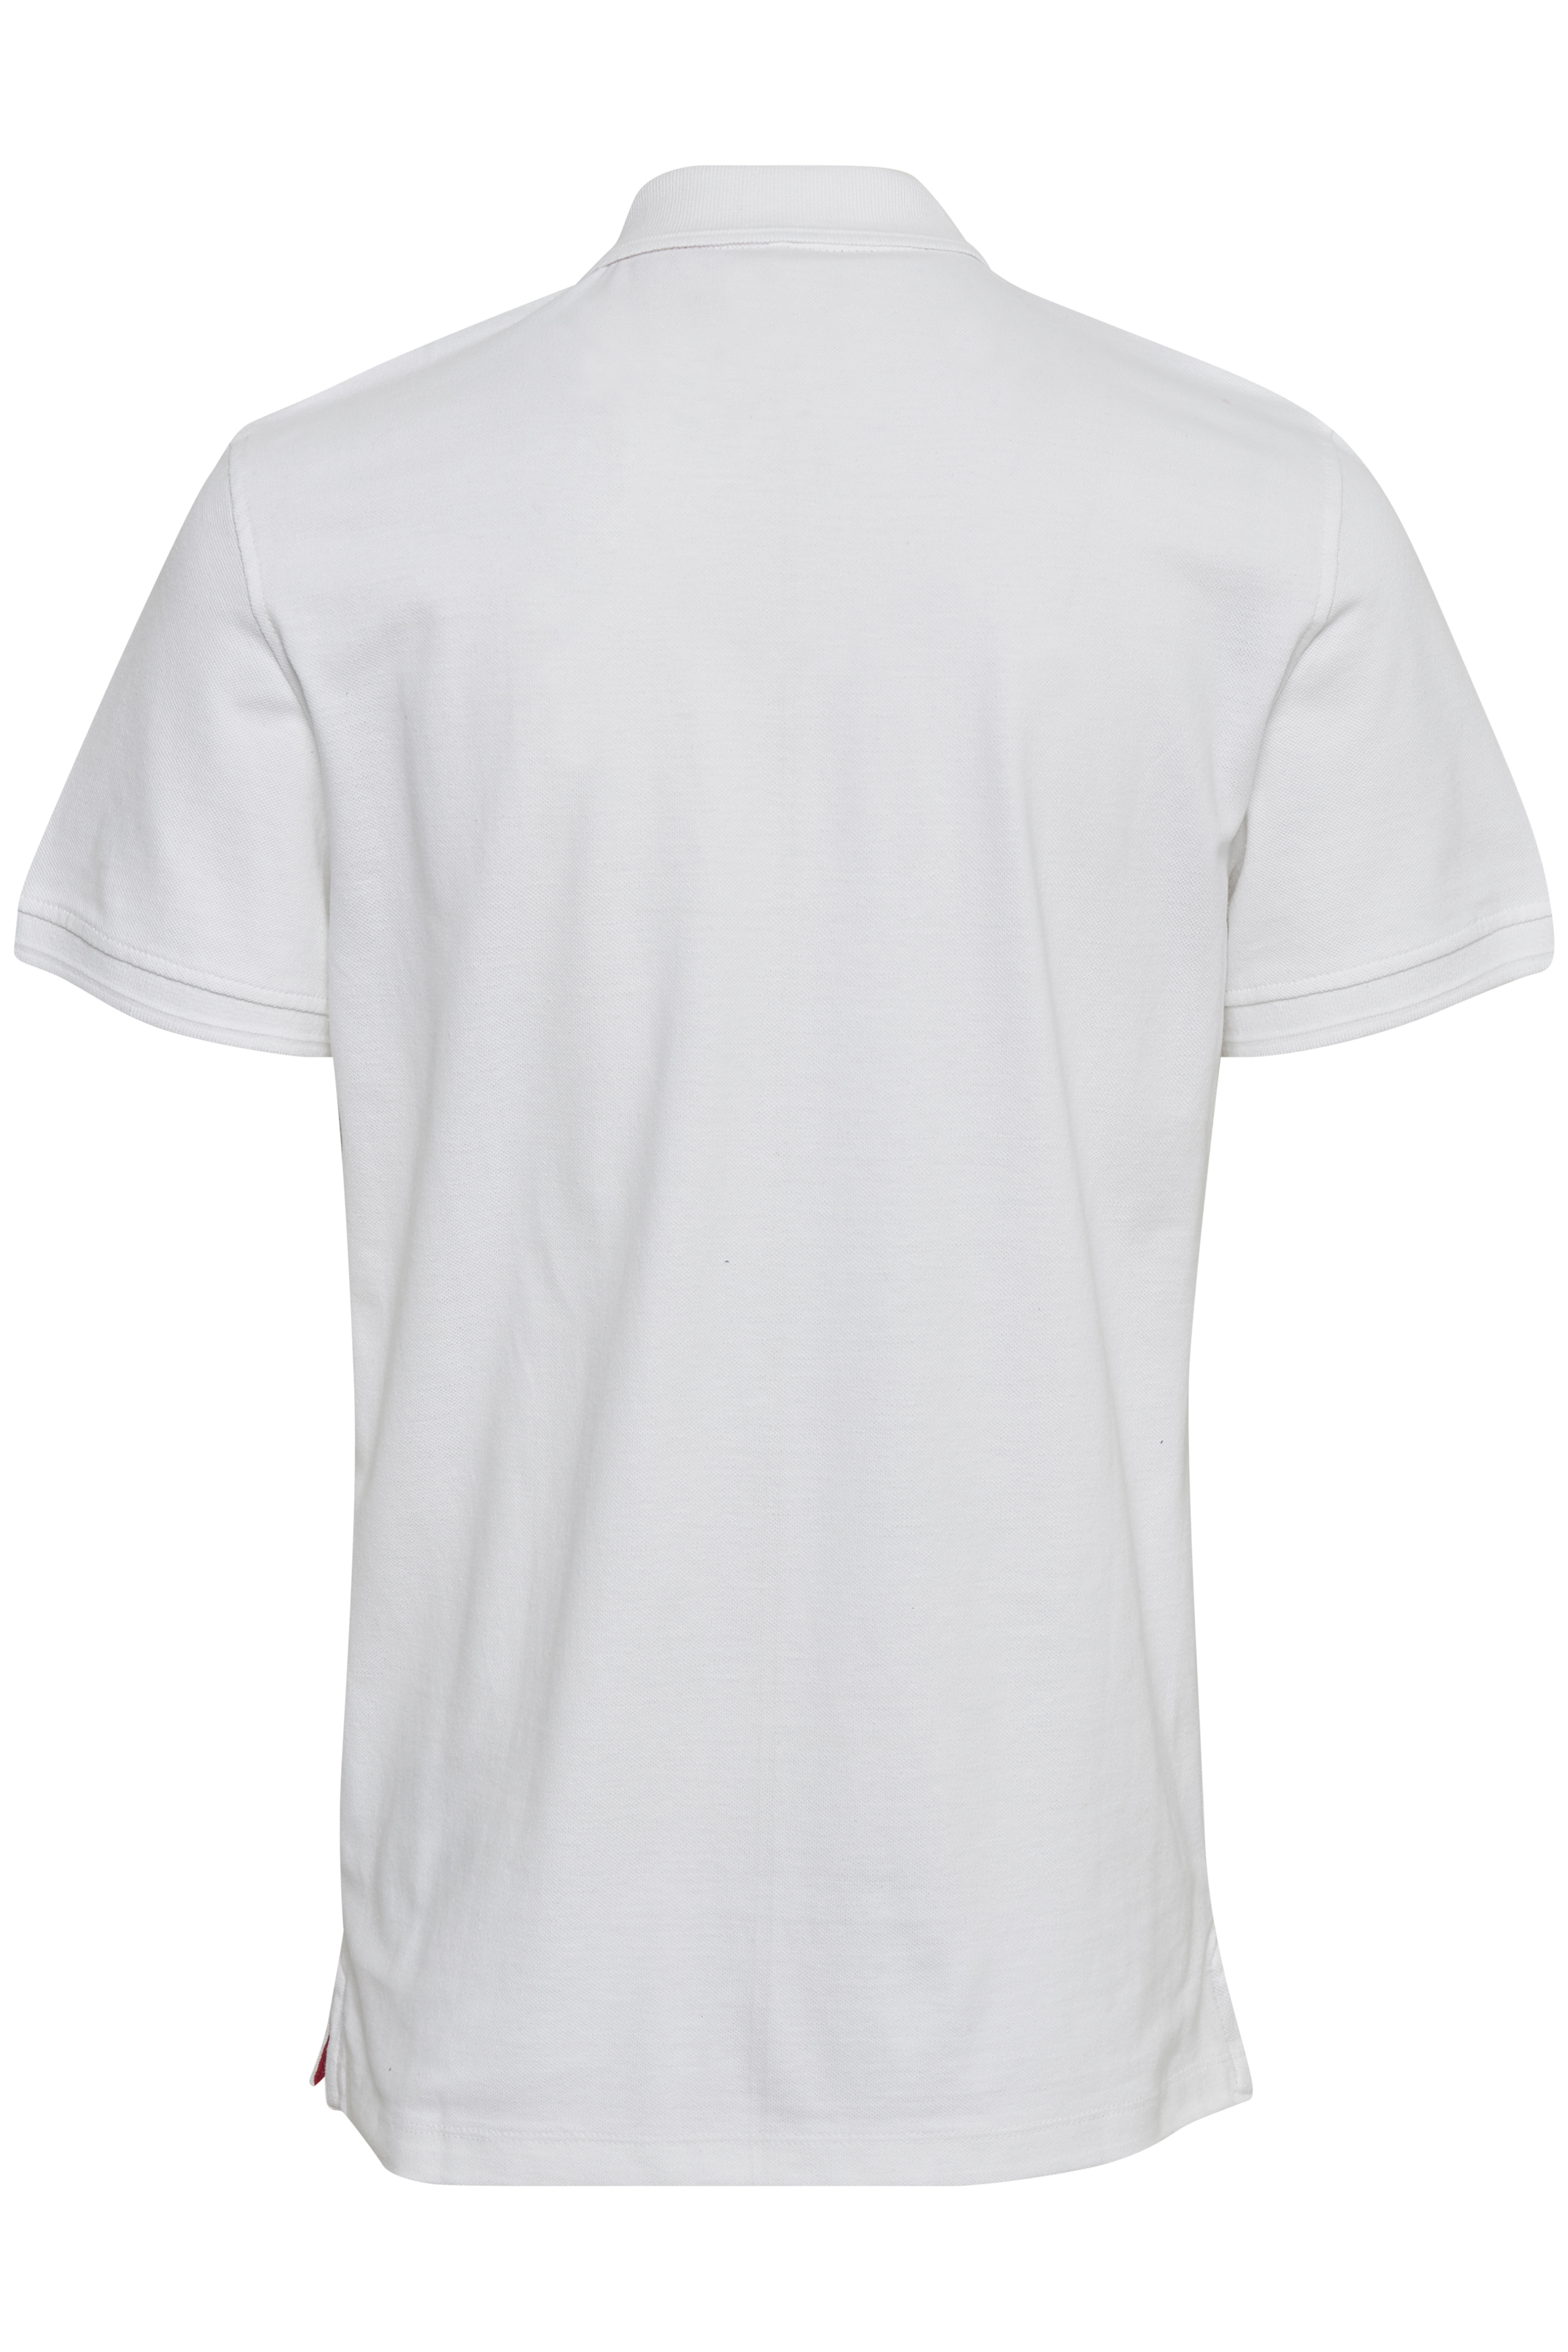 White Polo-shirt – Køb White Polo-shirt fra str. S-XXL her